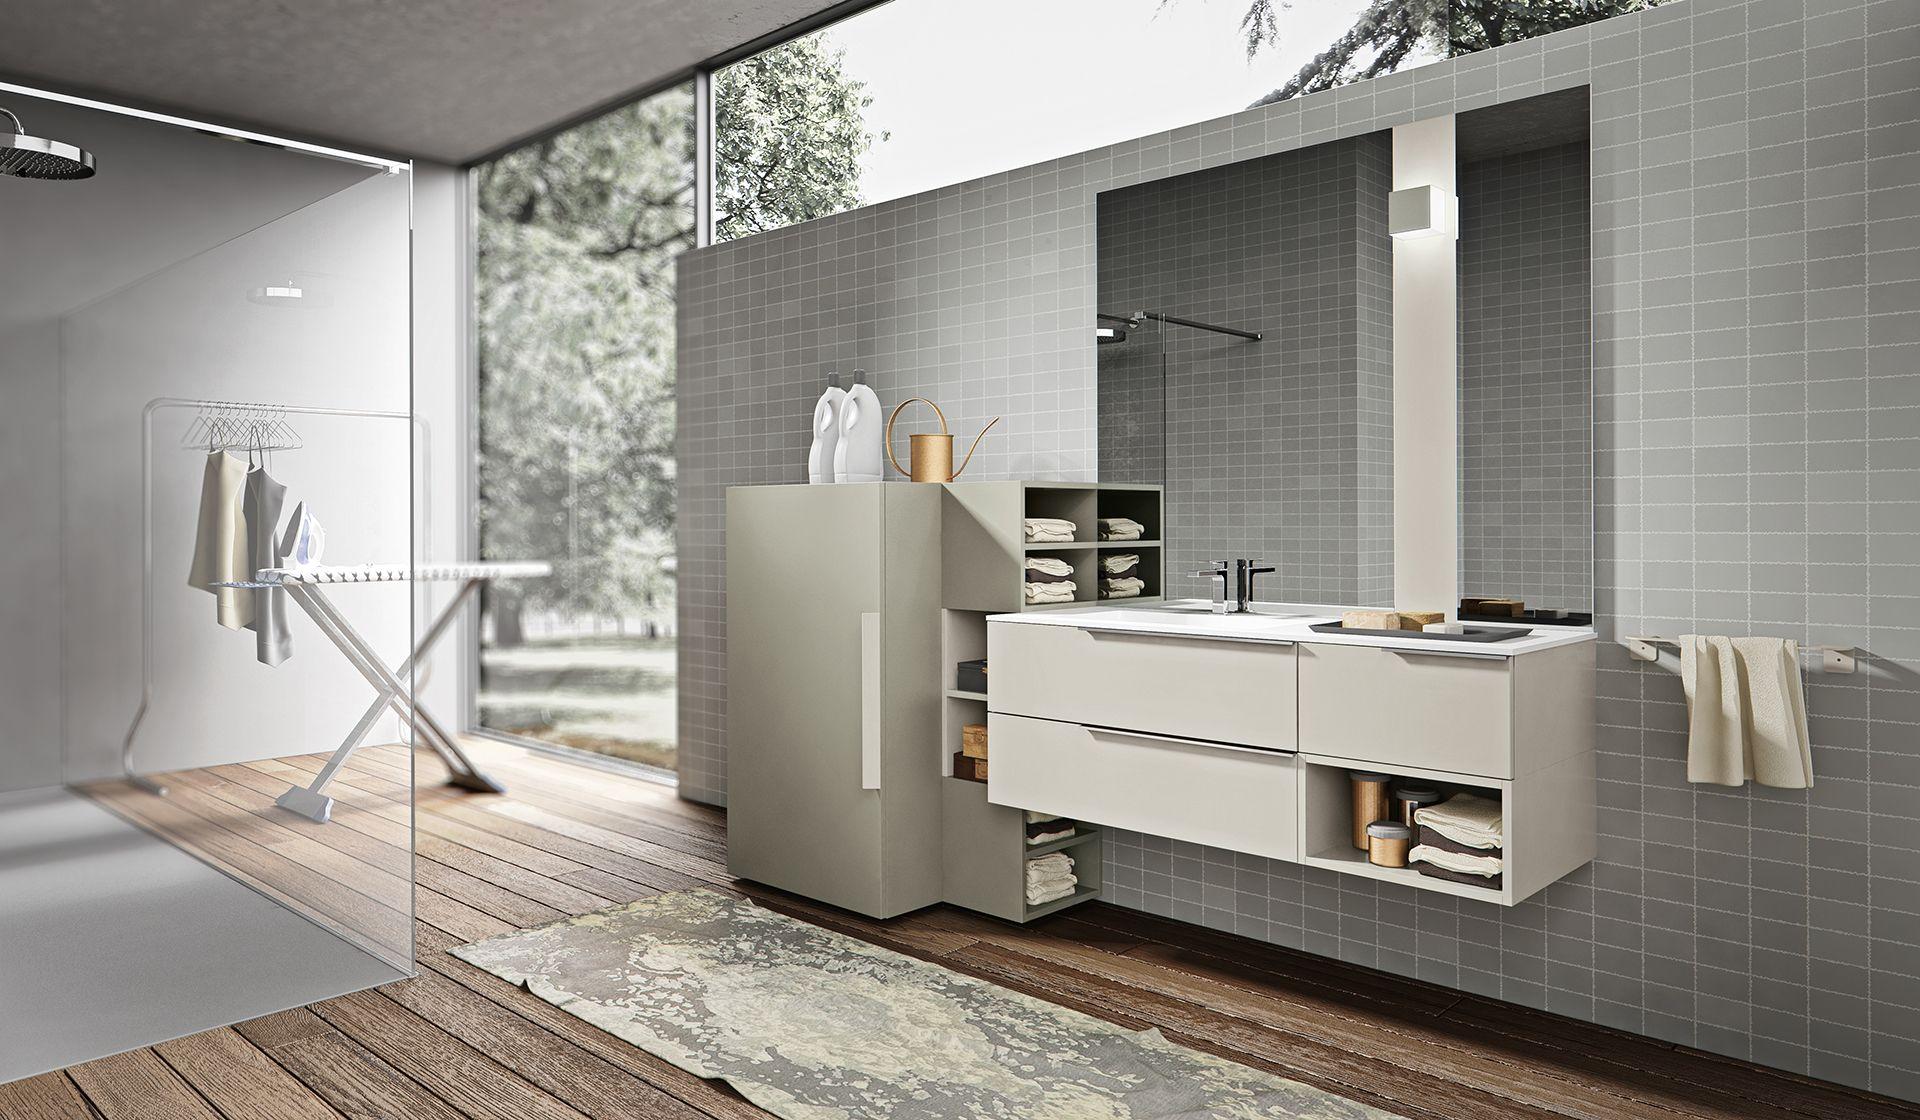 mobili arredo bagno moderni: giunone - agoràgroup - edoné design ... - Arredo Bagno Pozzuoli